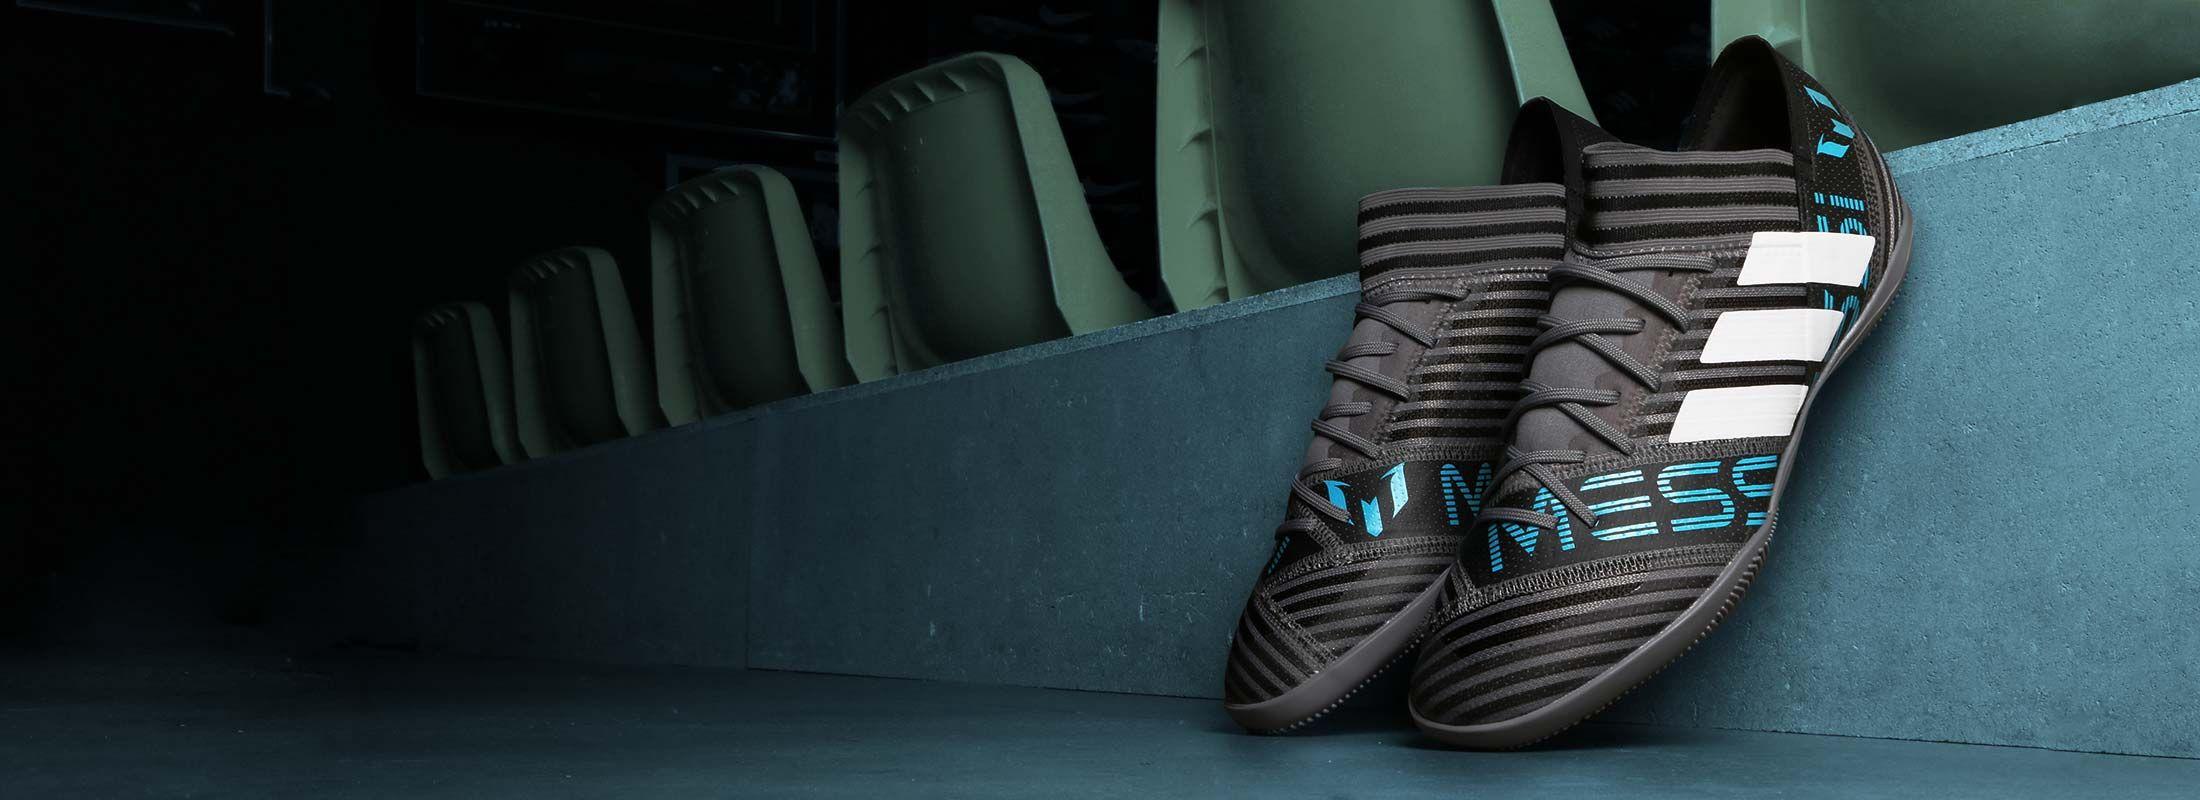 terrorismo Tibio China  Compra > zapatos adidas futbol sala 2018- OFF 64% - noyansimsek.com!